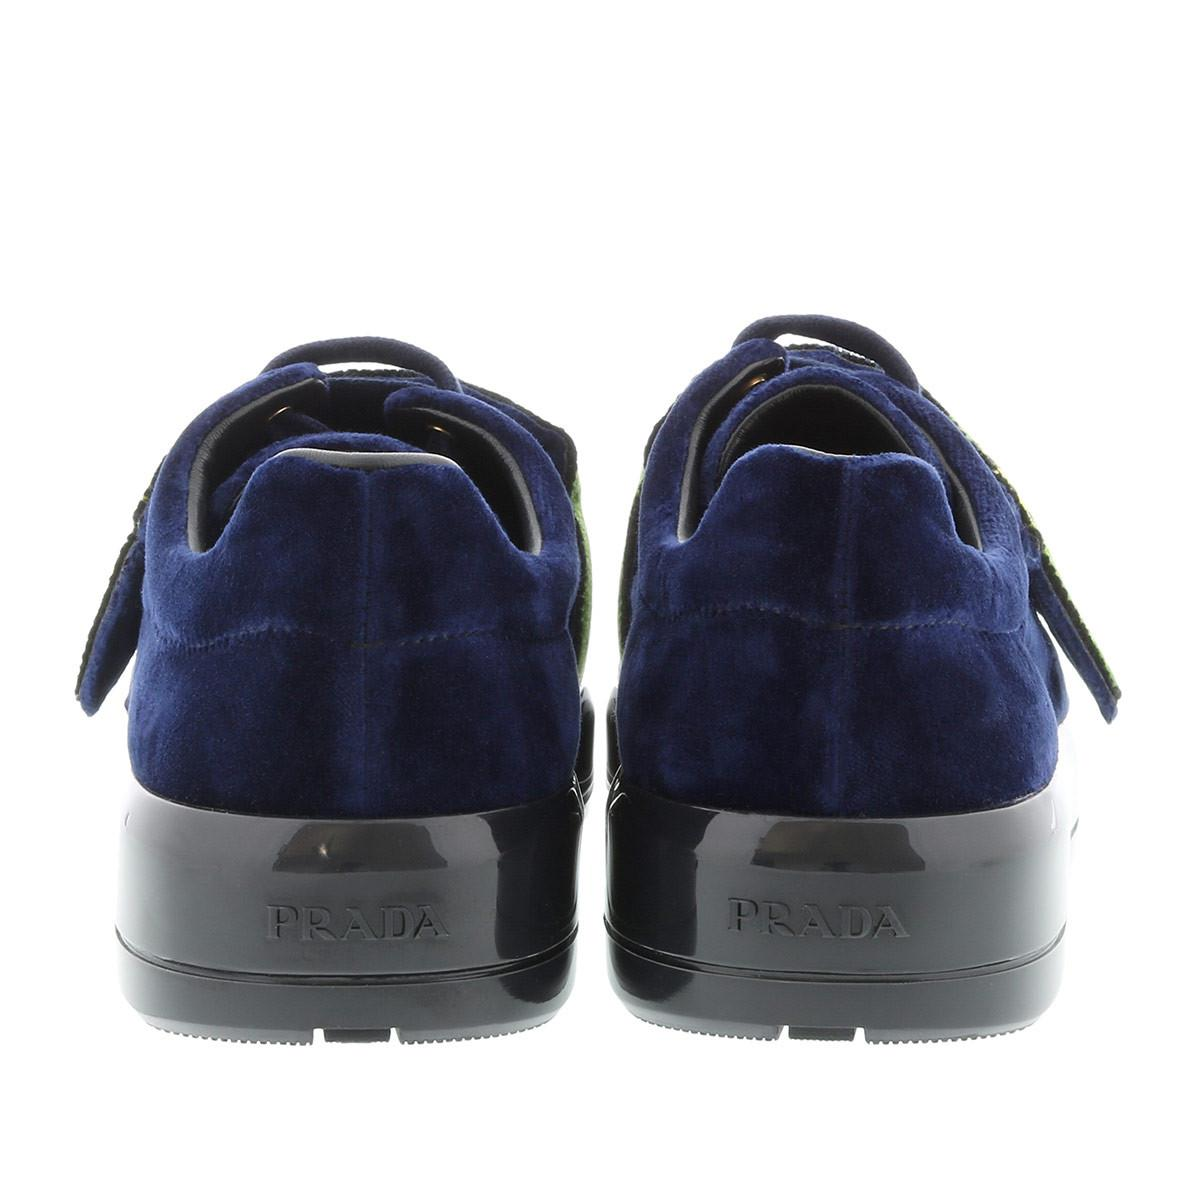 Prada Cahier Velvet Sneaker Inchiostro in Blue